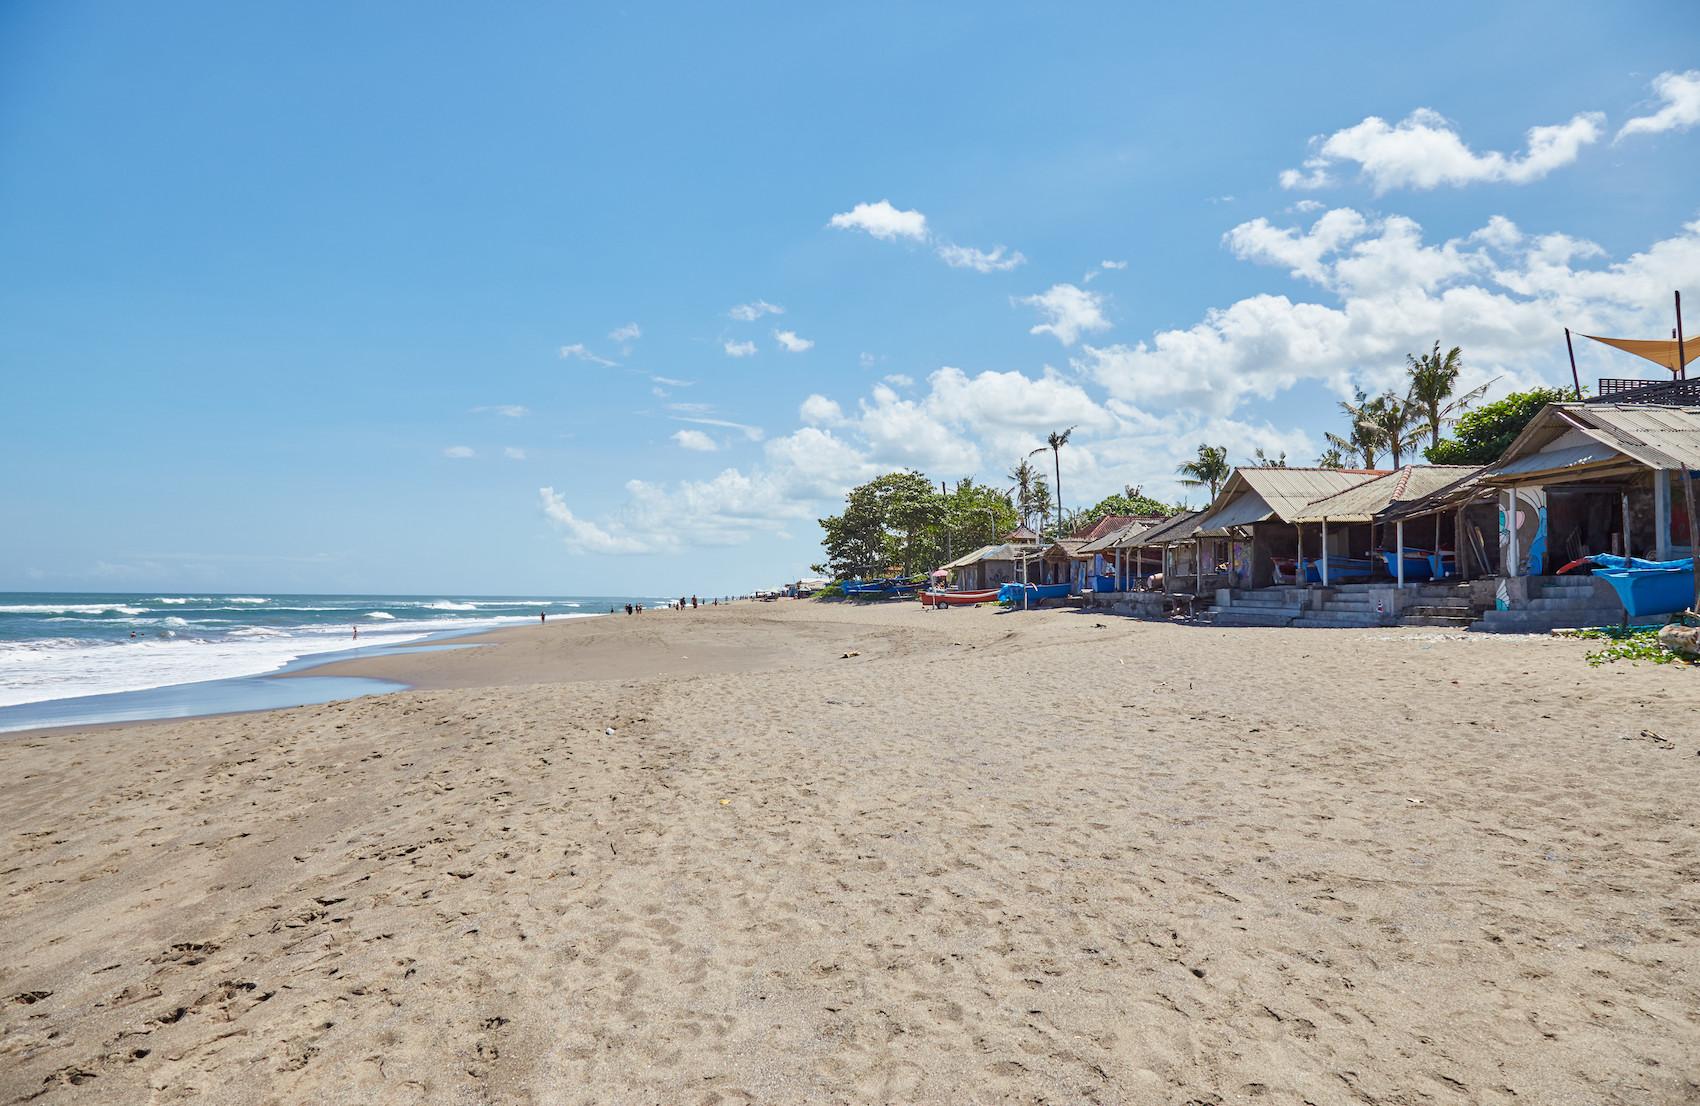 Bali Beach Canggu